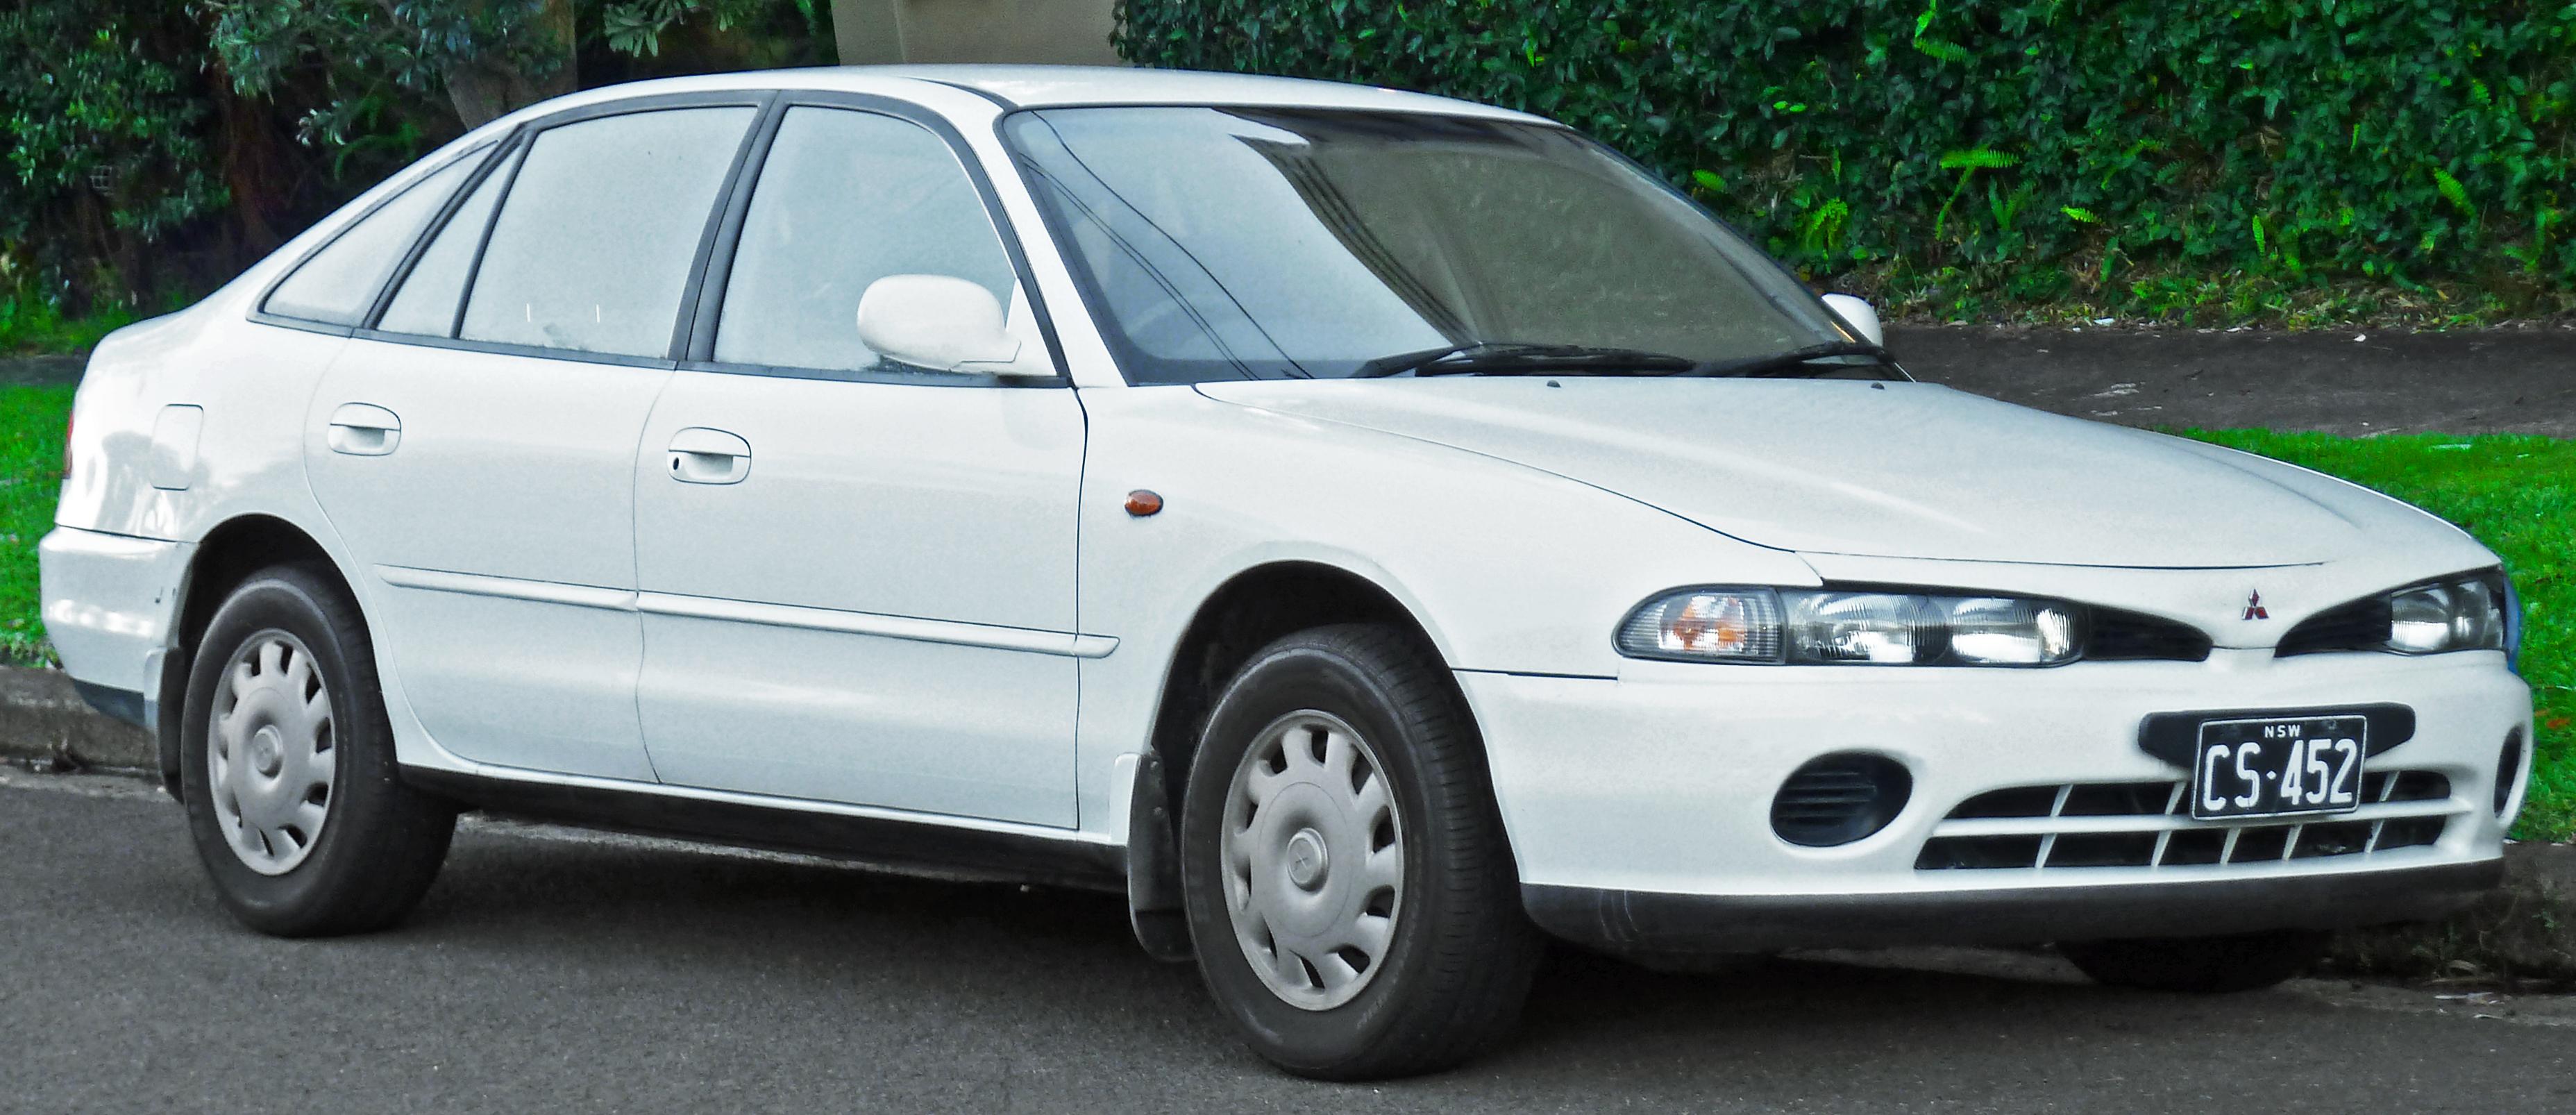 Mitsubishi Galant neuf et d'occasion à vendre  Brampton autoHEBDO